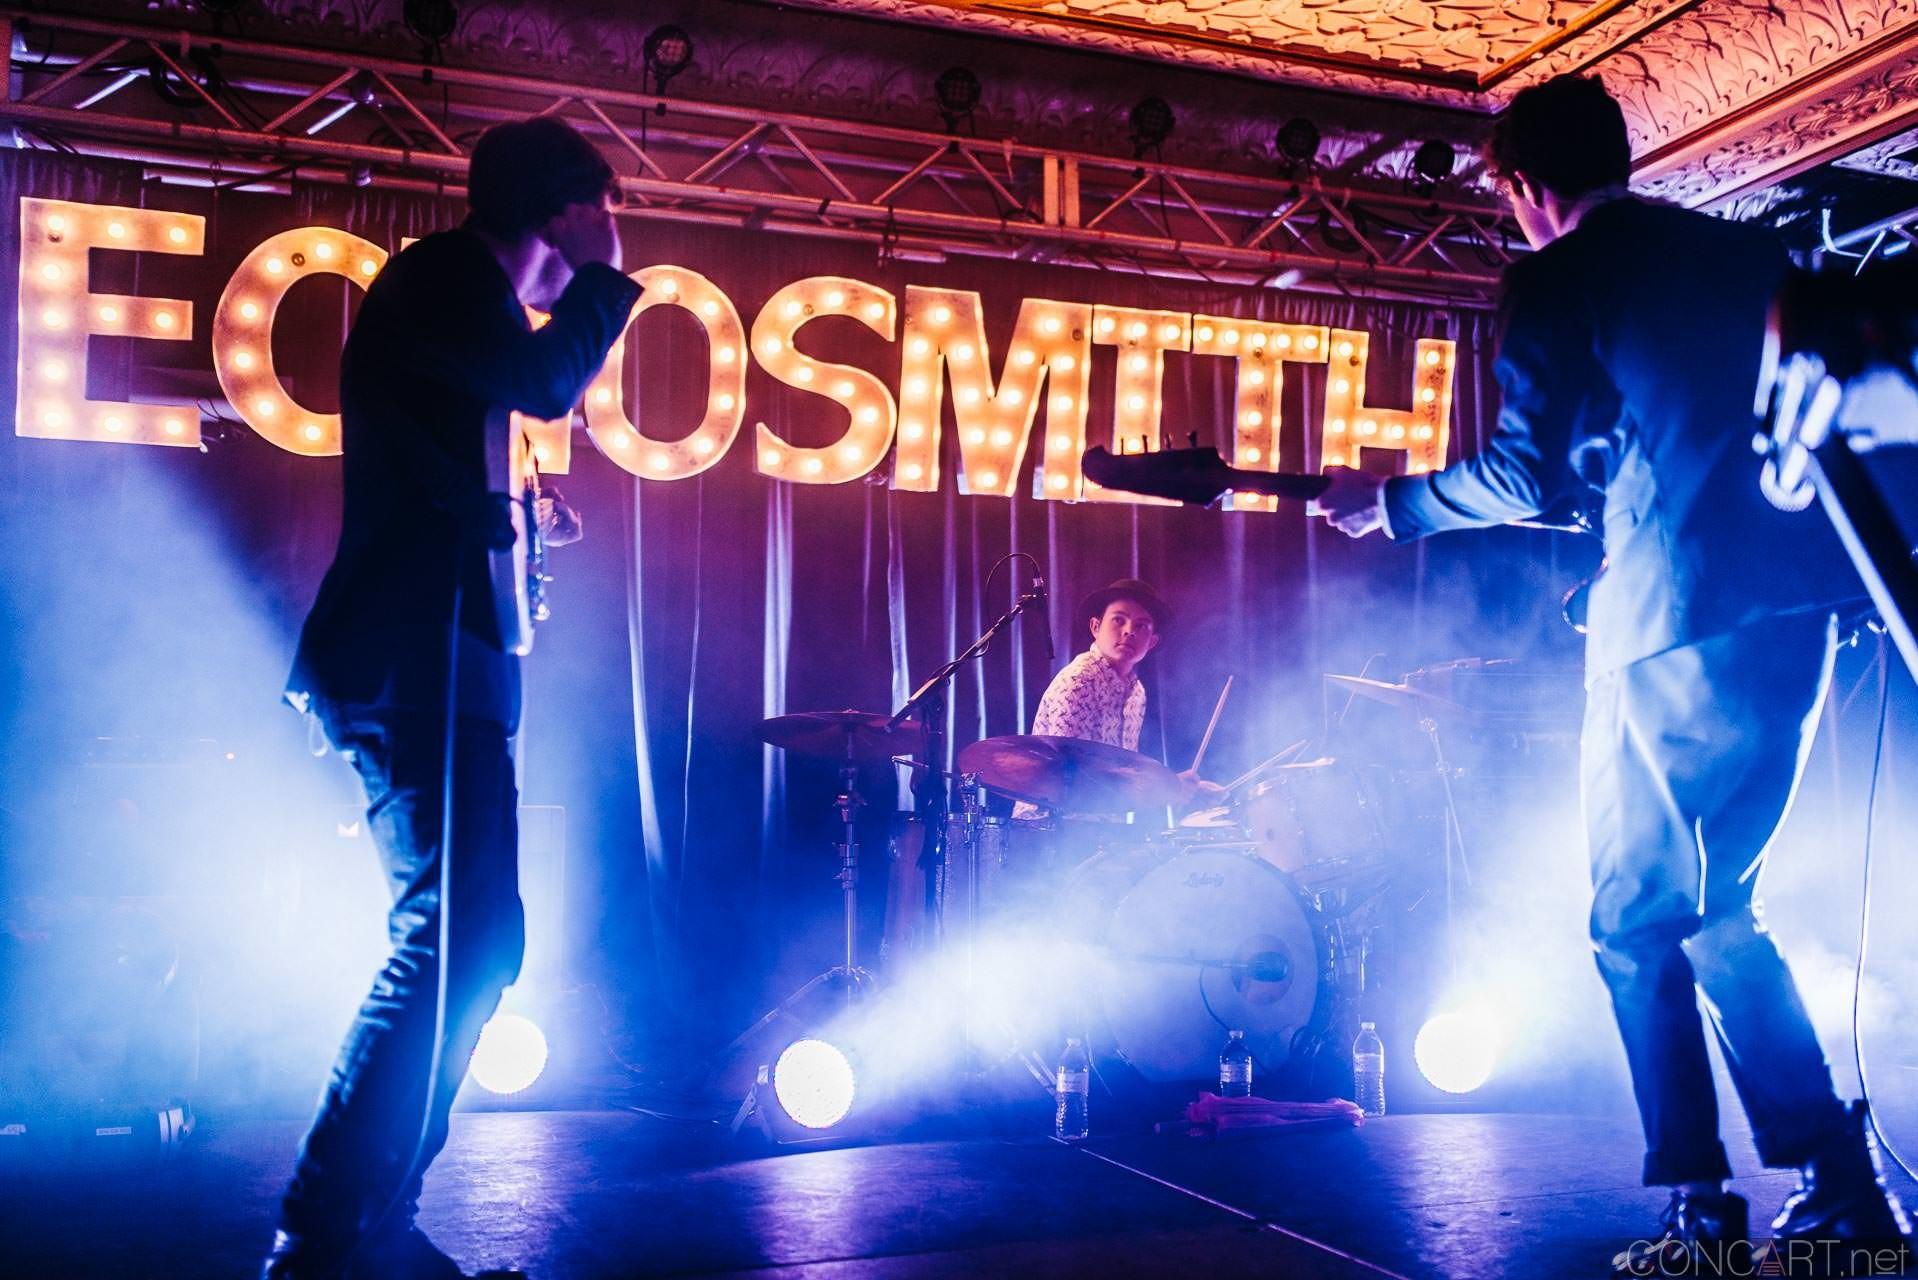 Echosmith photo by Sean Molin 8